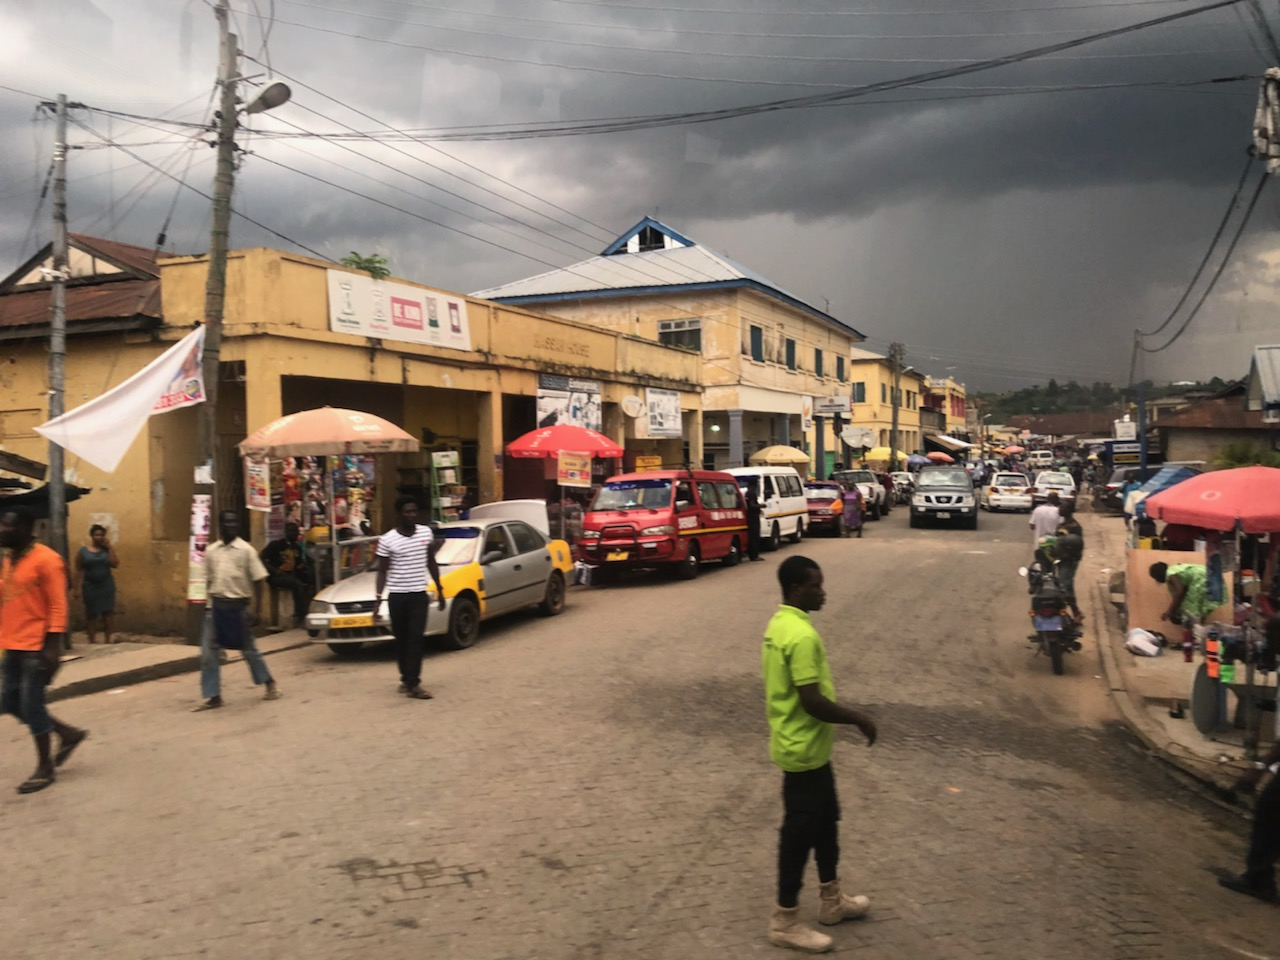 OPERATION WALK 2018 GHANA - STORM AHEAD